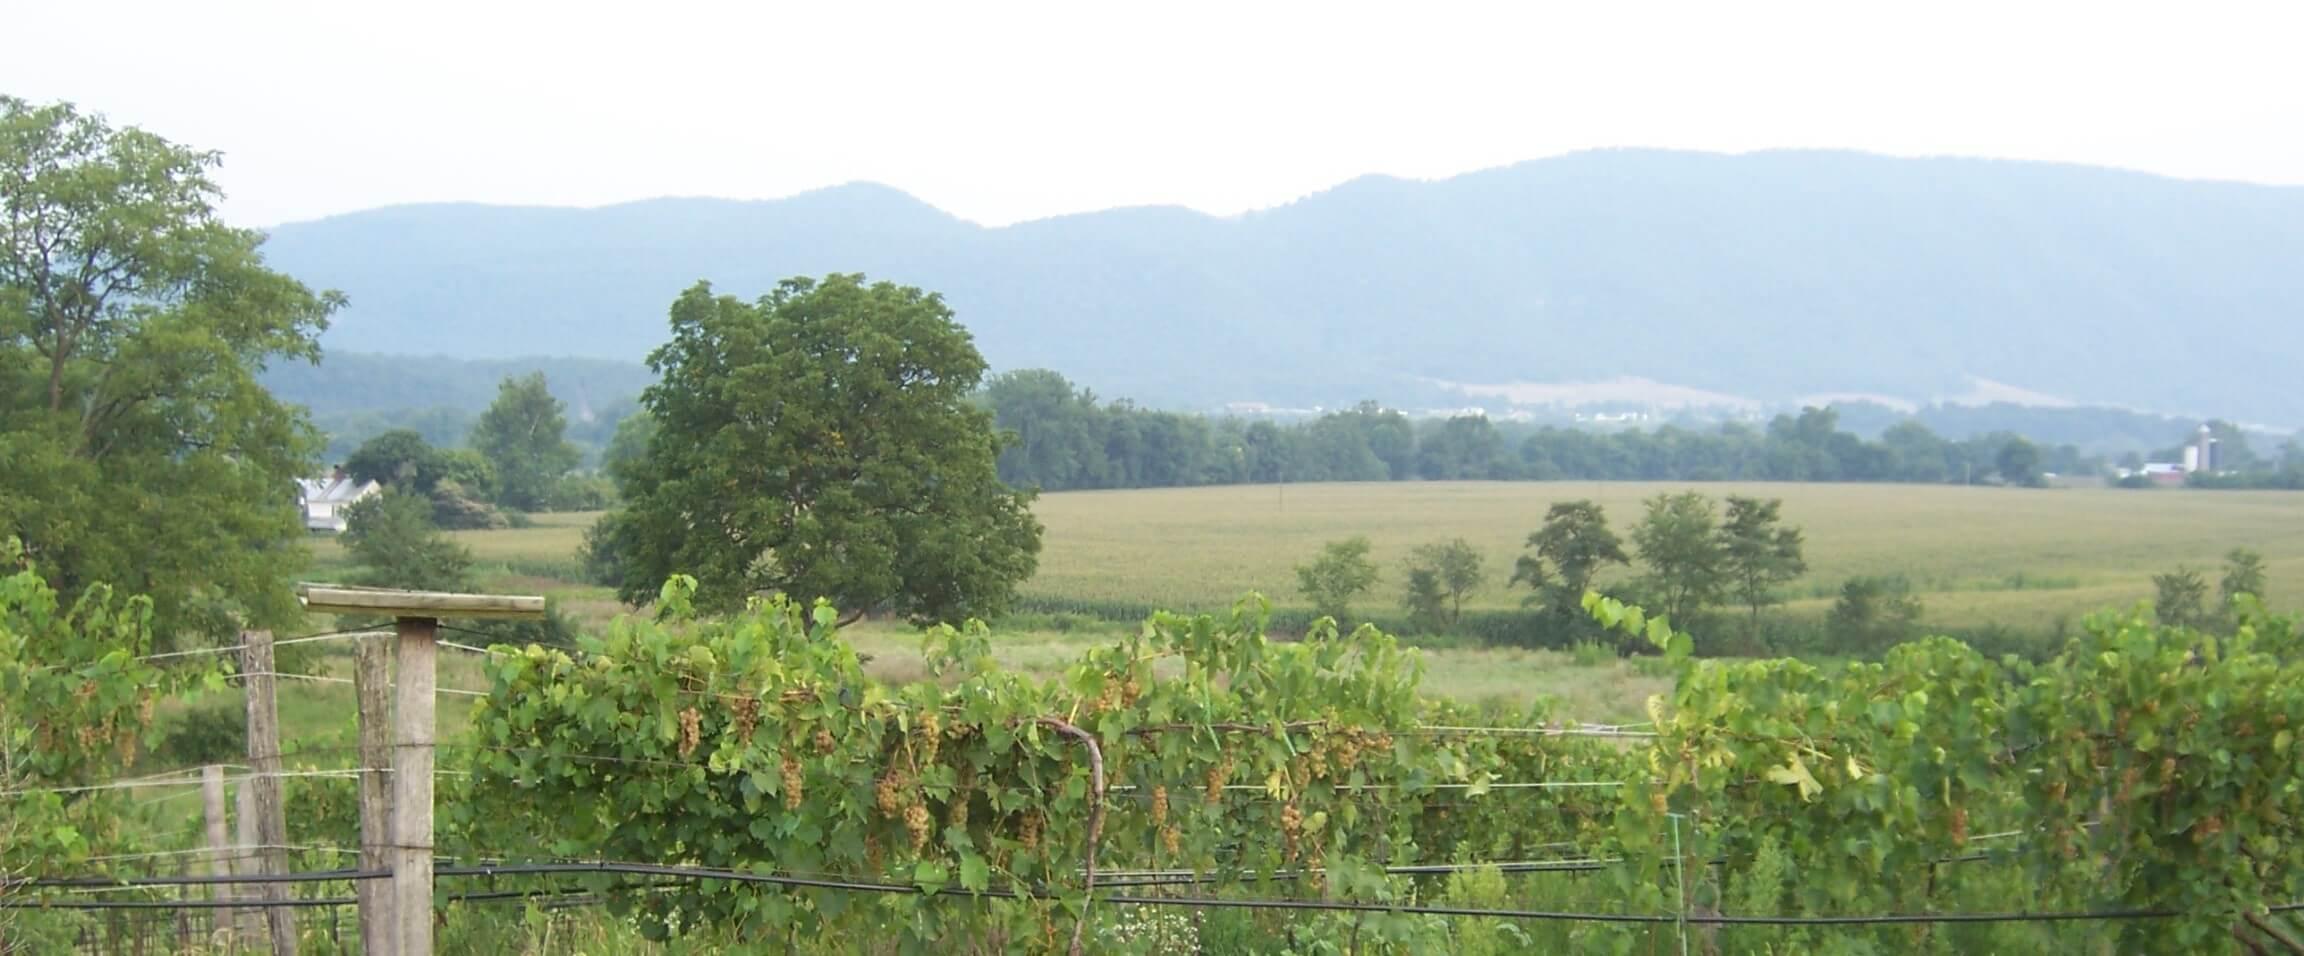 West Whitehill Farmscape 2.JPG